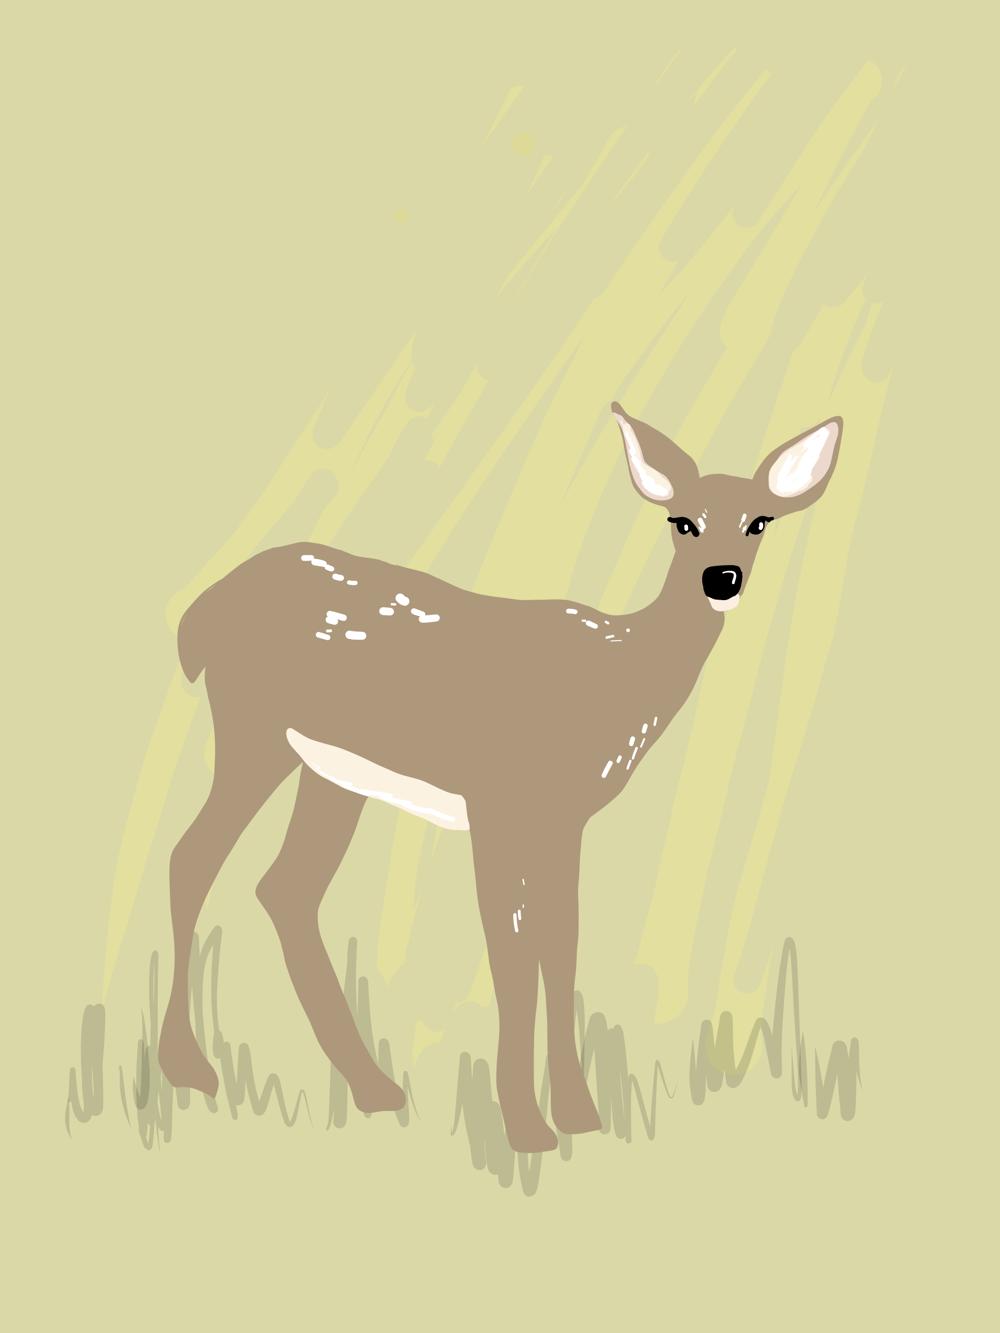 Deer vector illustration - image 2 - student project